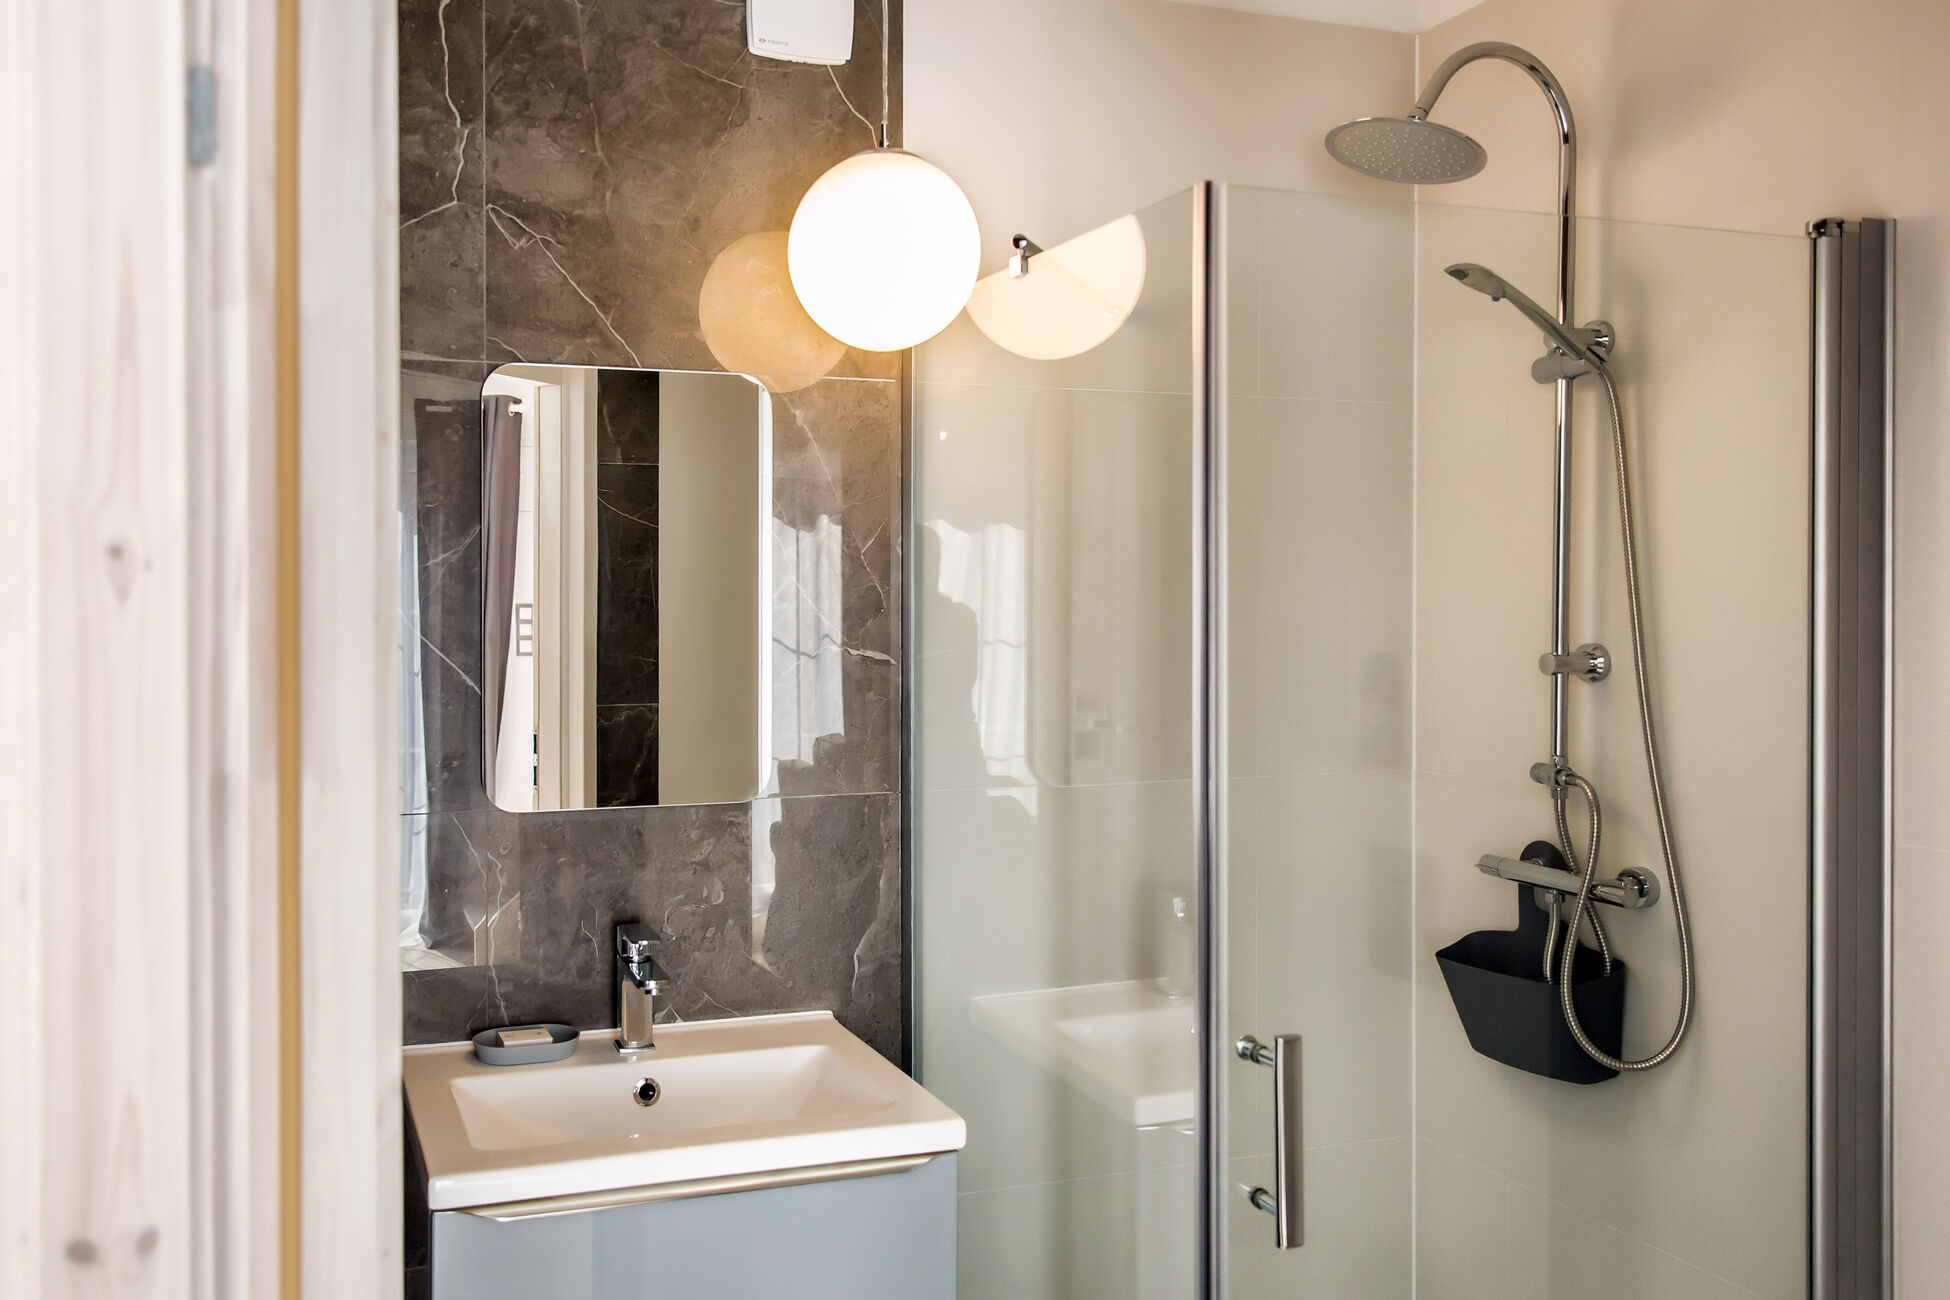 łazienka w villi baltica